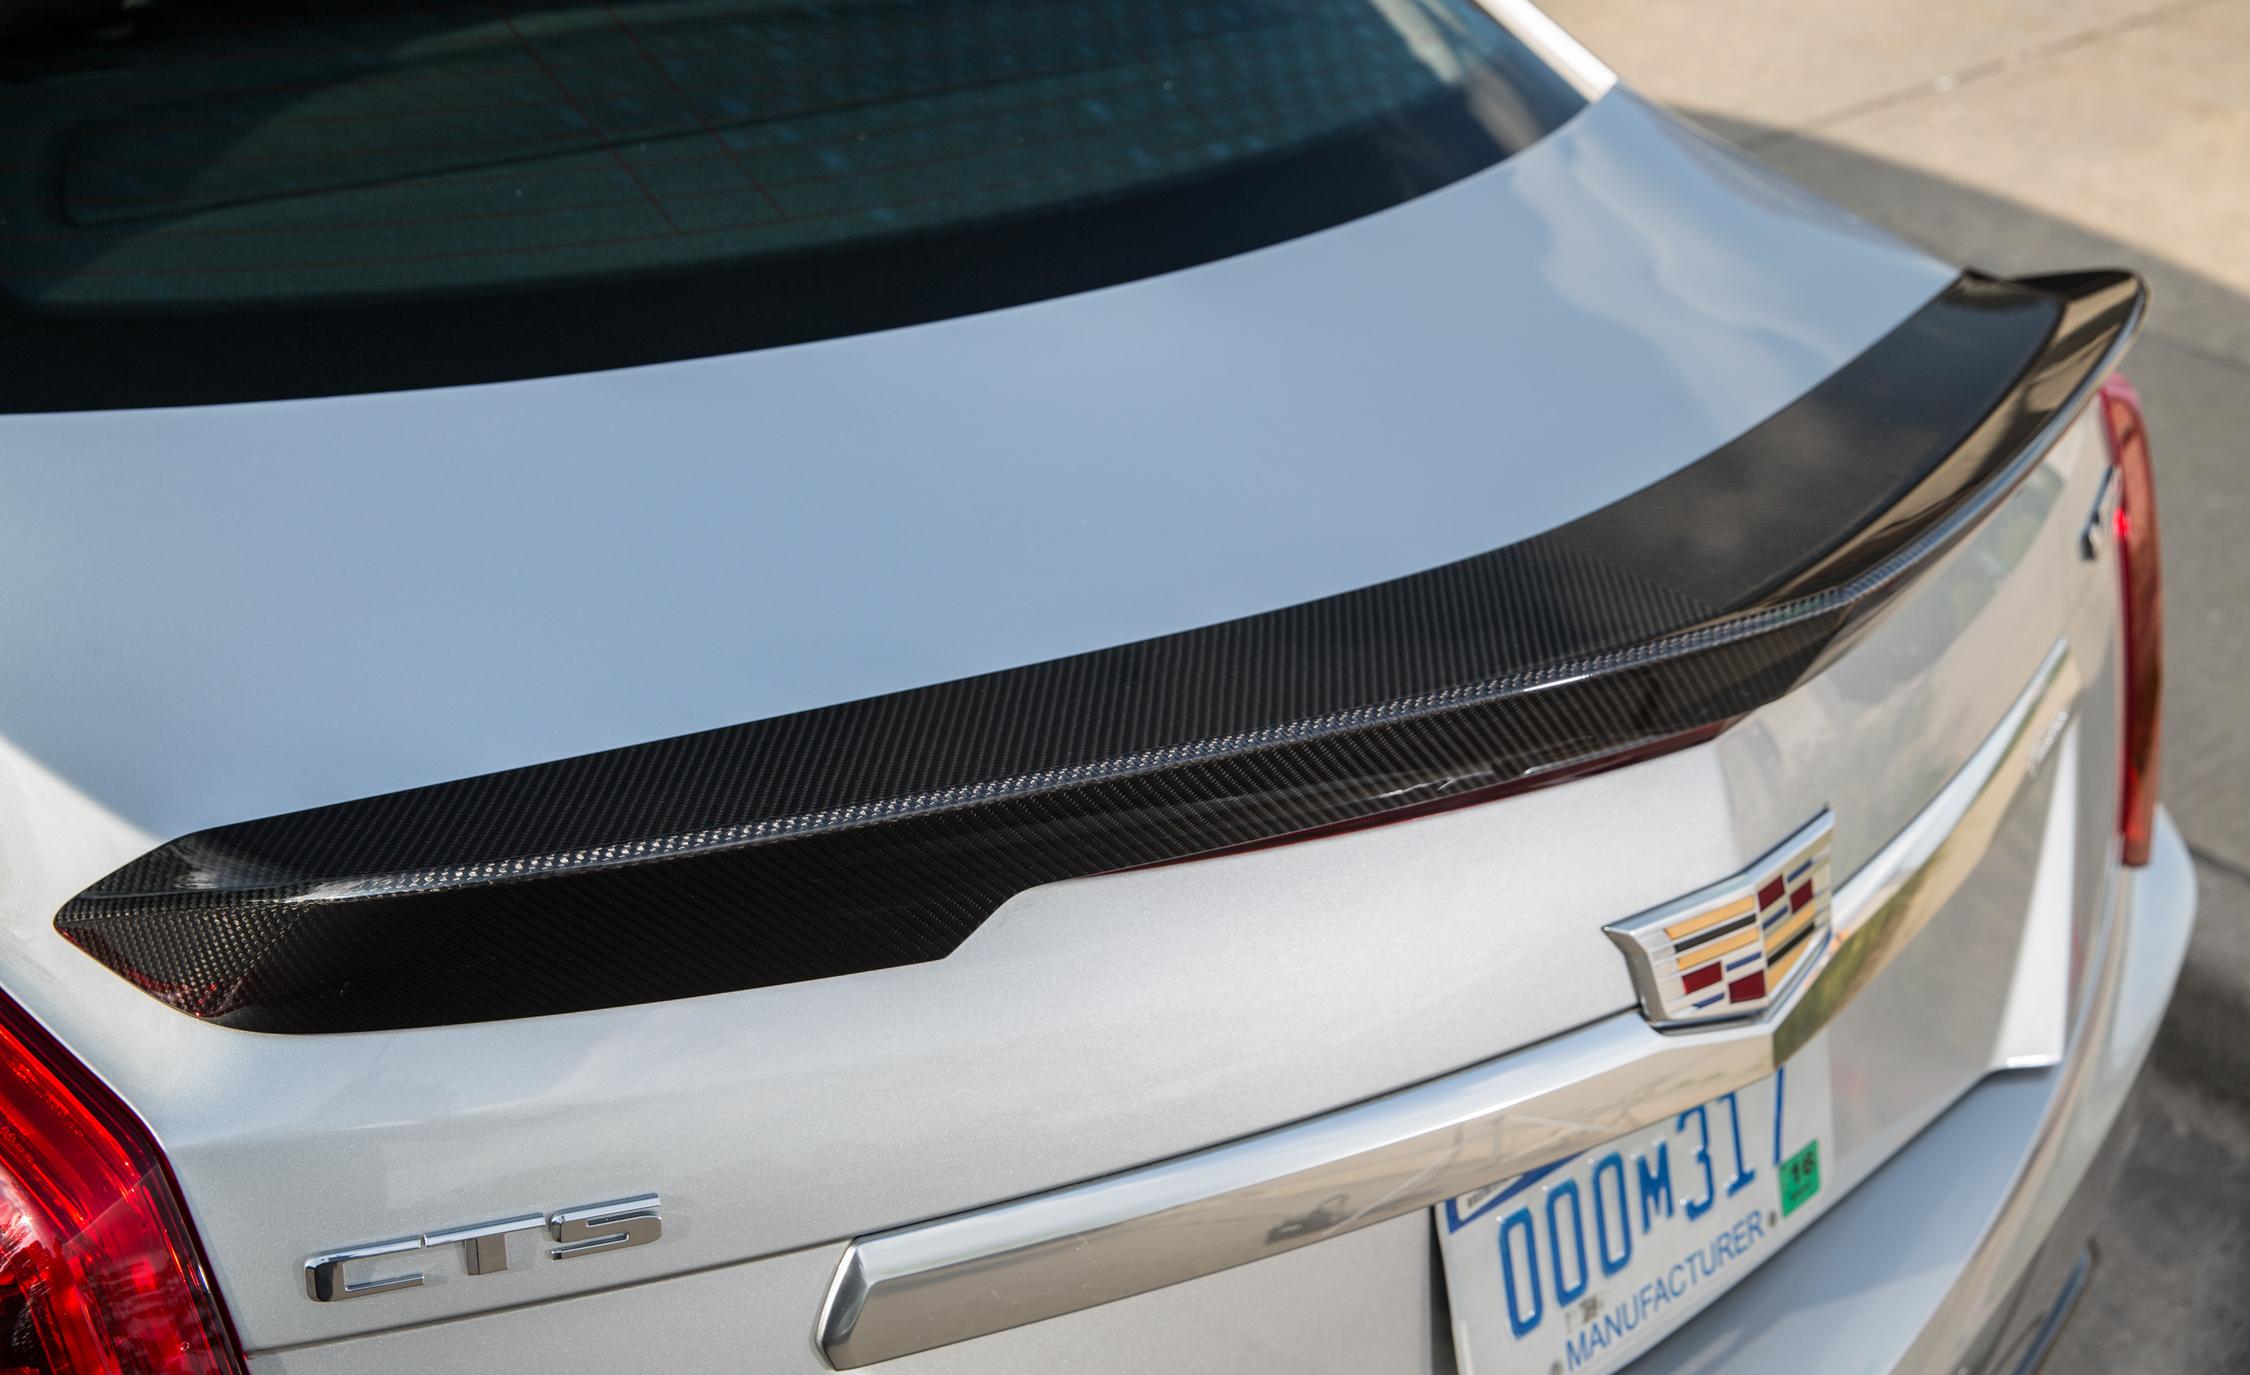 2016 Cadillac CTS-V Exterior Rear Spoiler